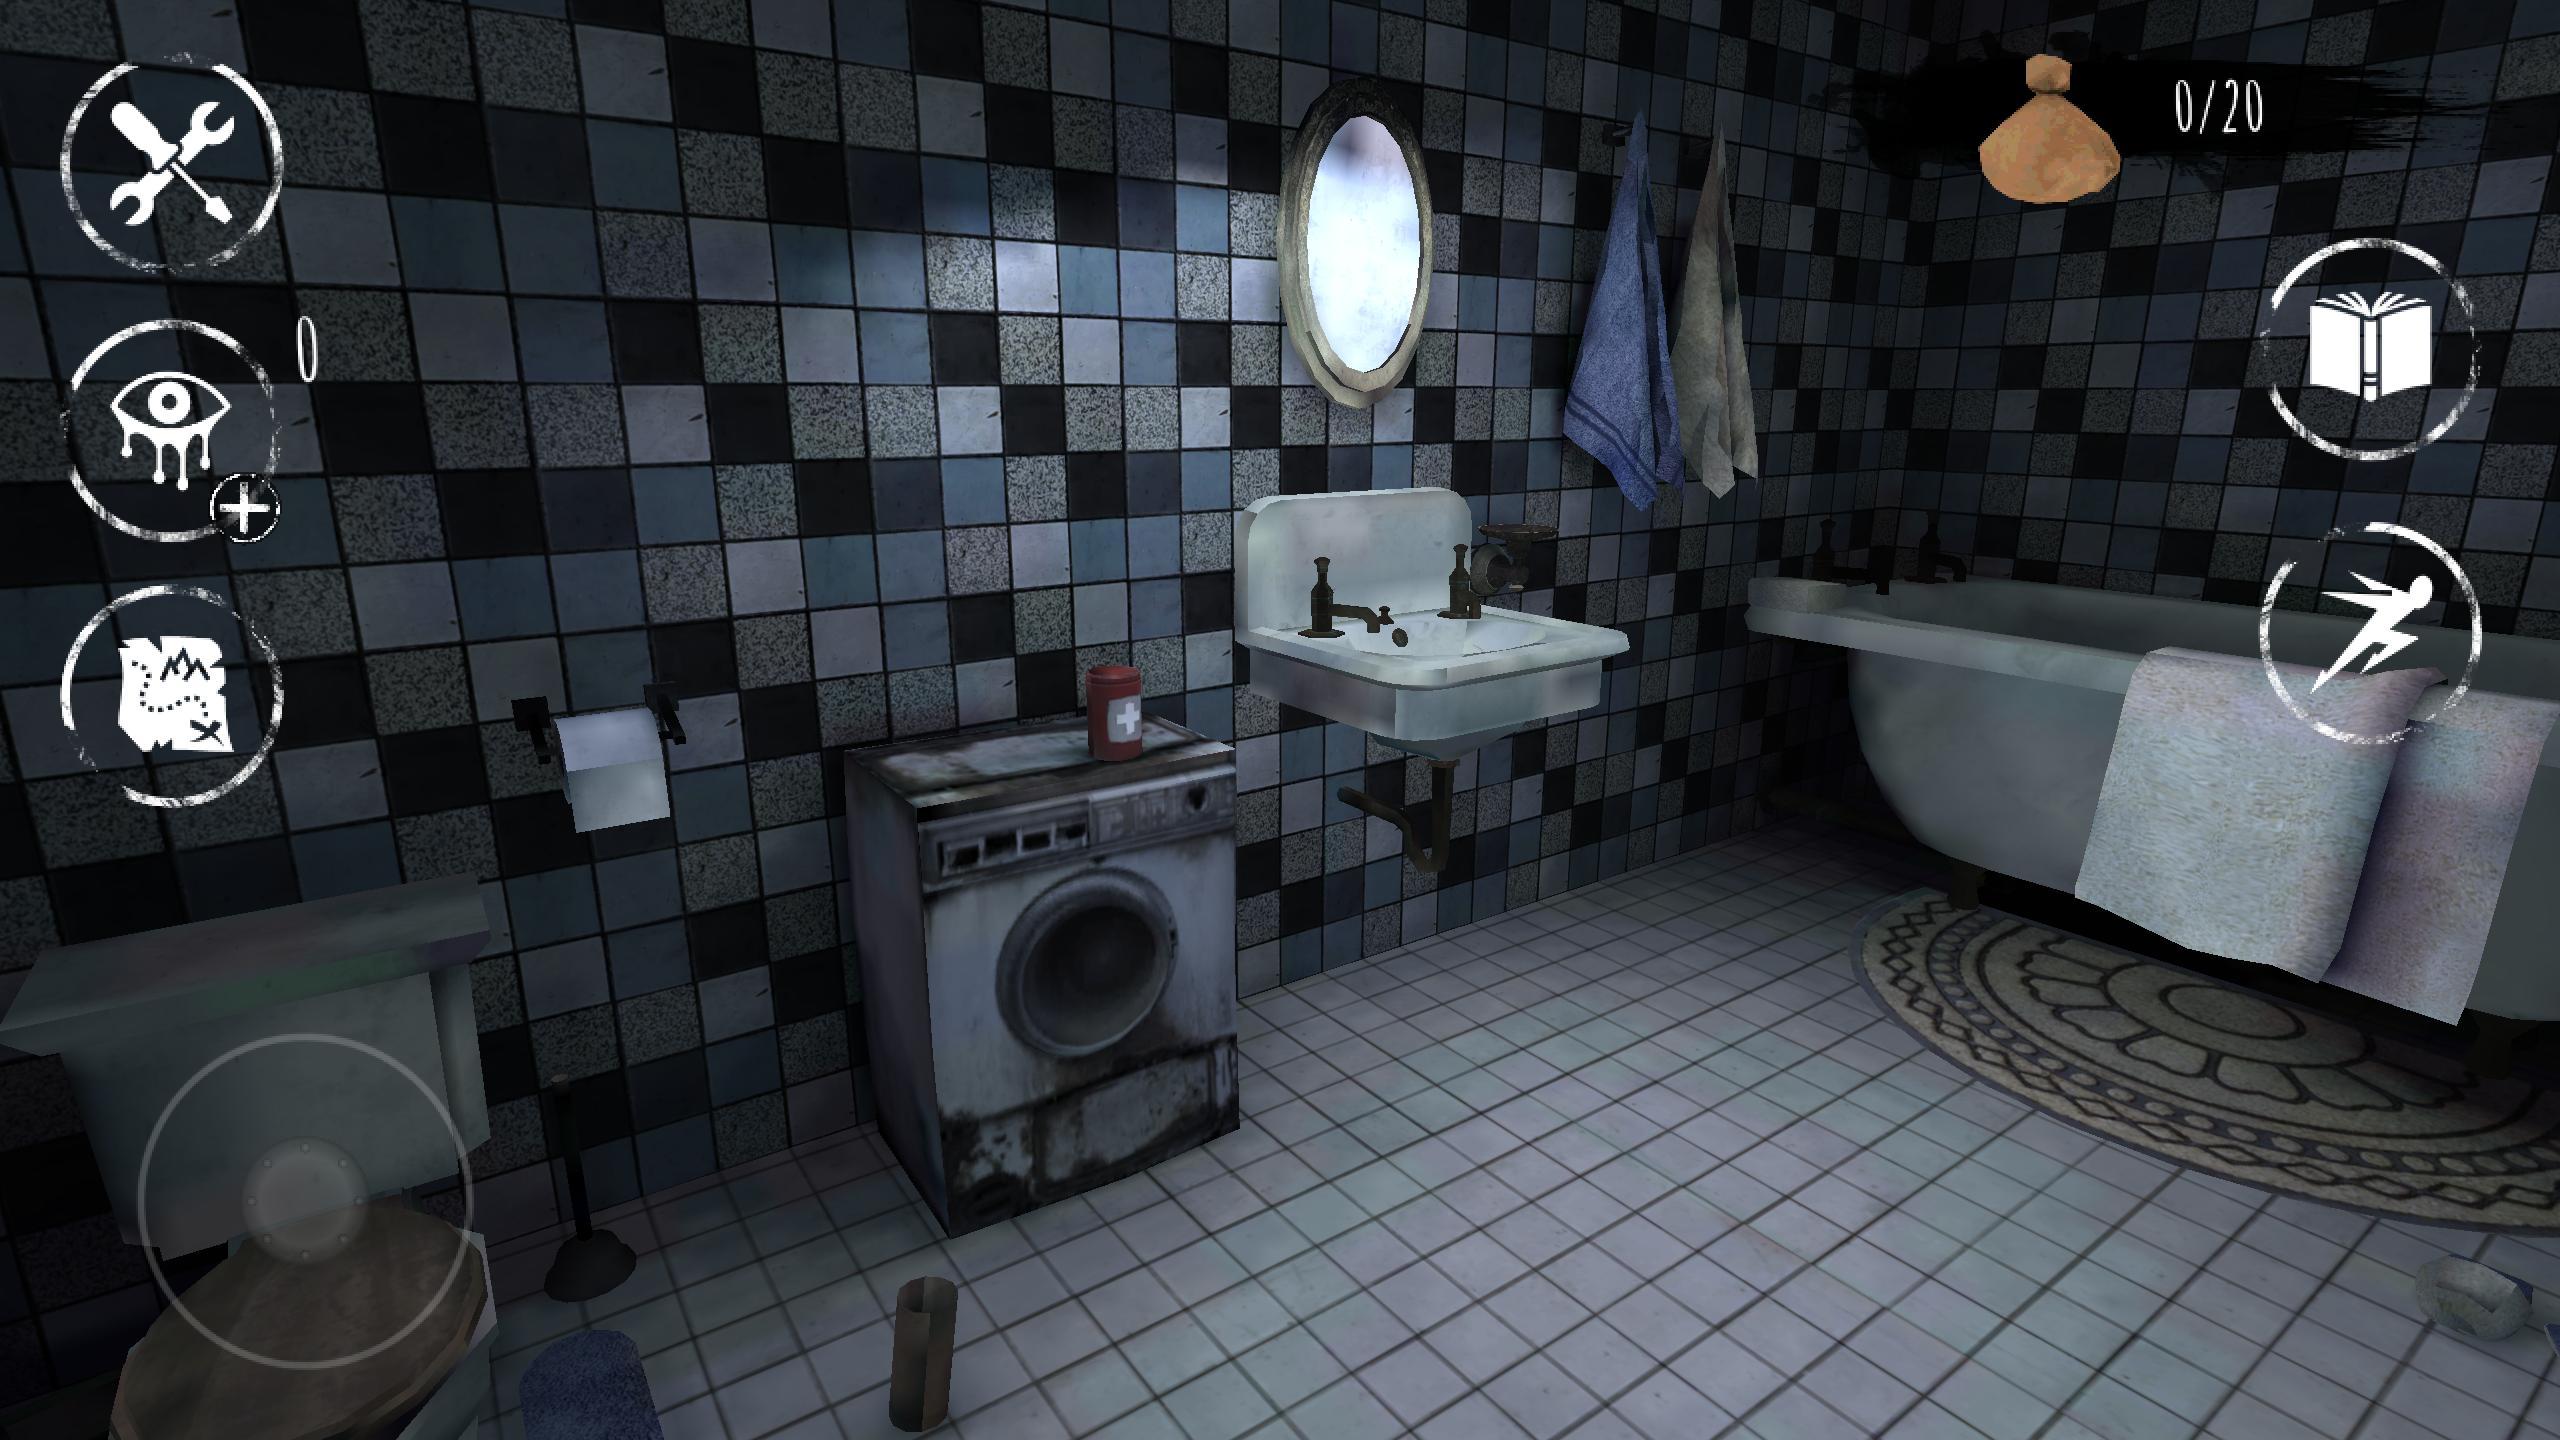 Eyes: Scary Thriller - Creepy Horror Game 6.1.21 Screenshot 7